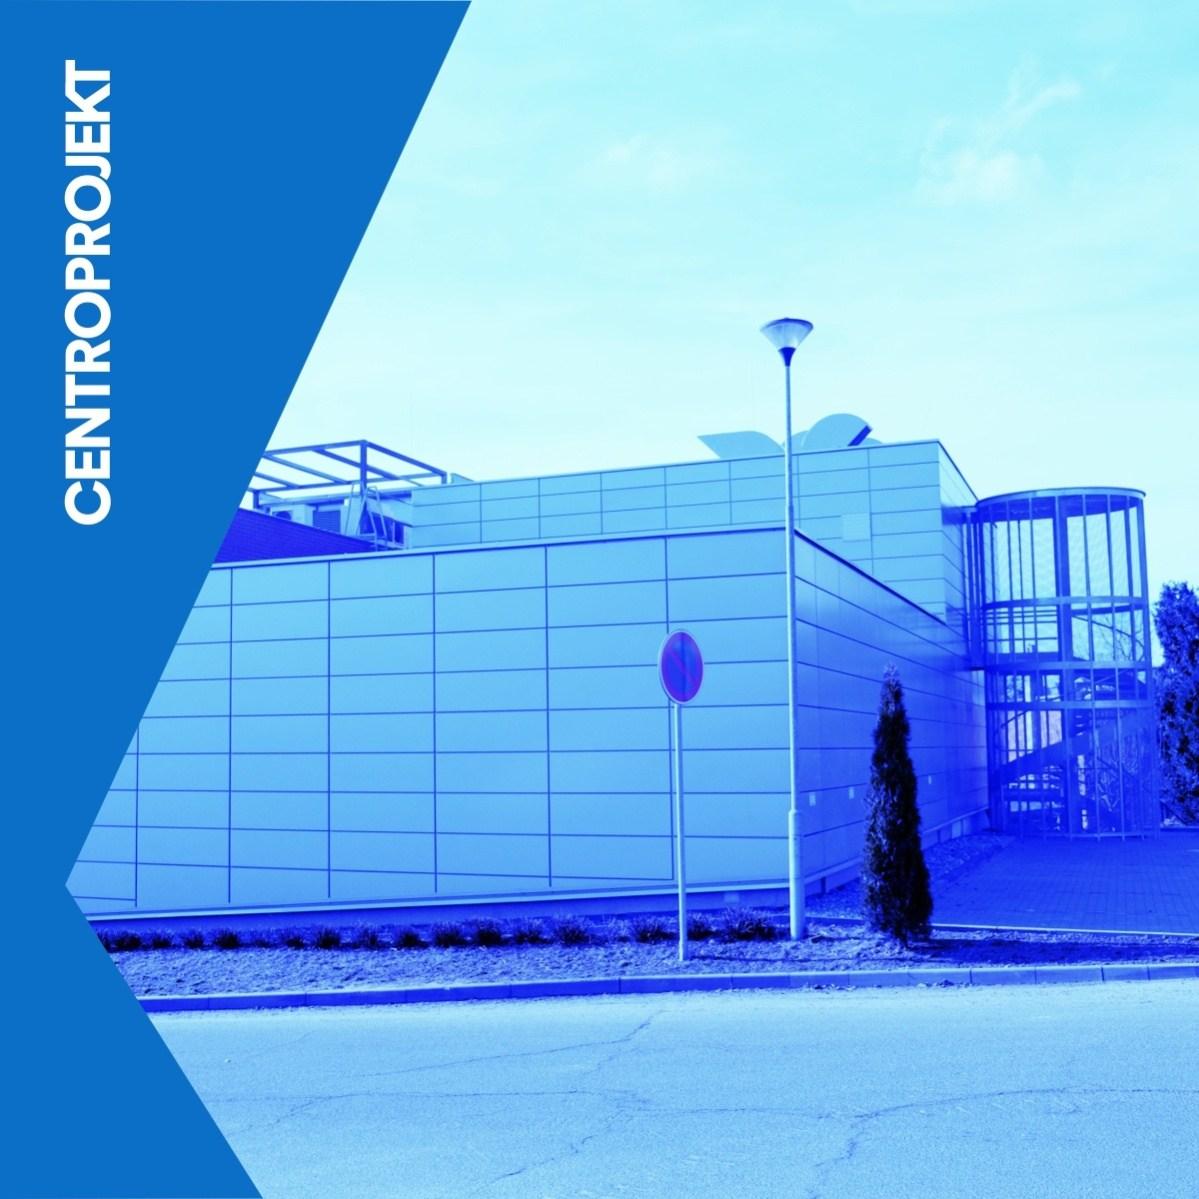 onkologie-kntb-stavba-roku-zk_centroprojekt